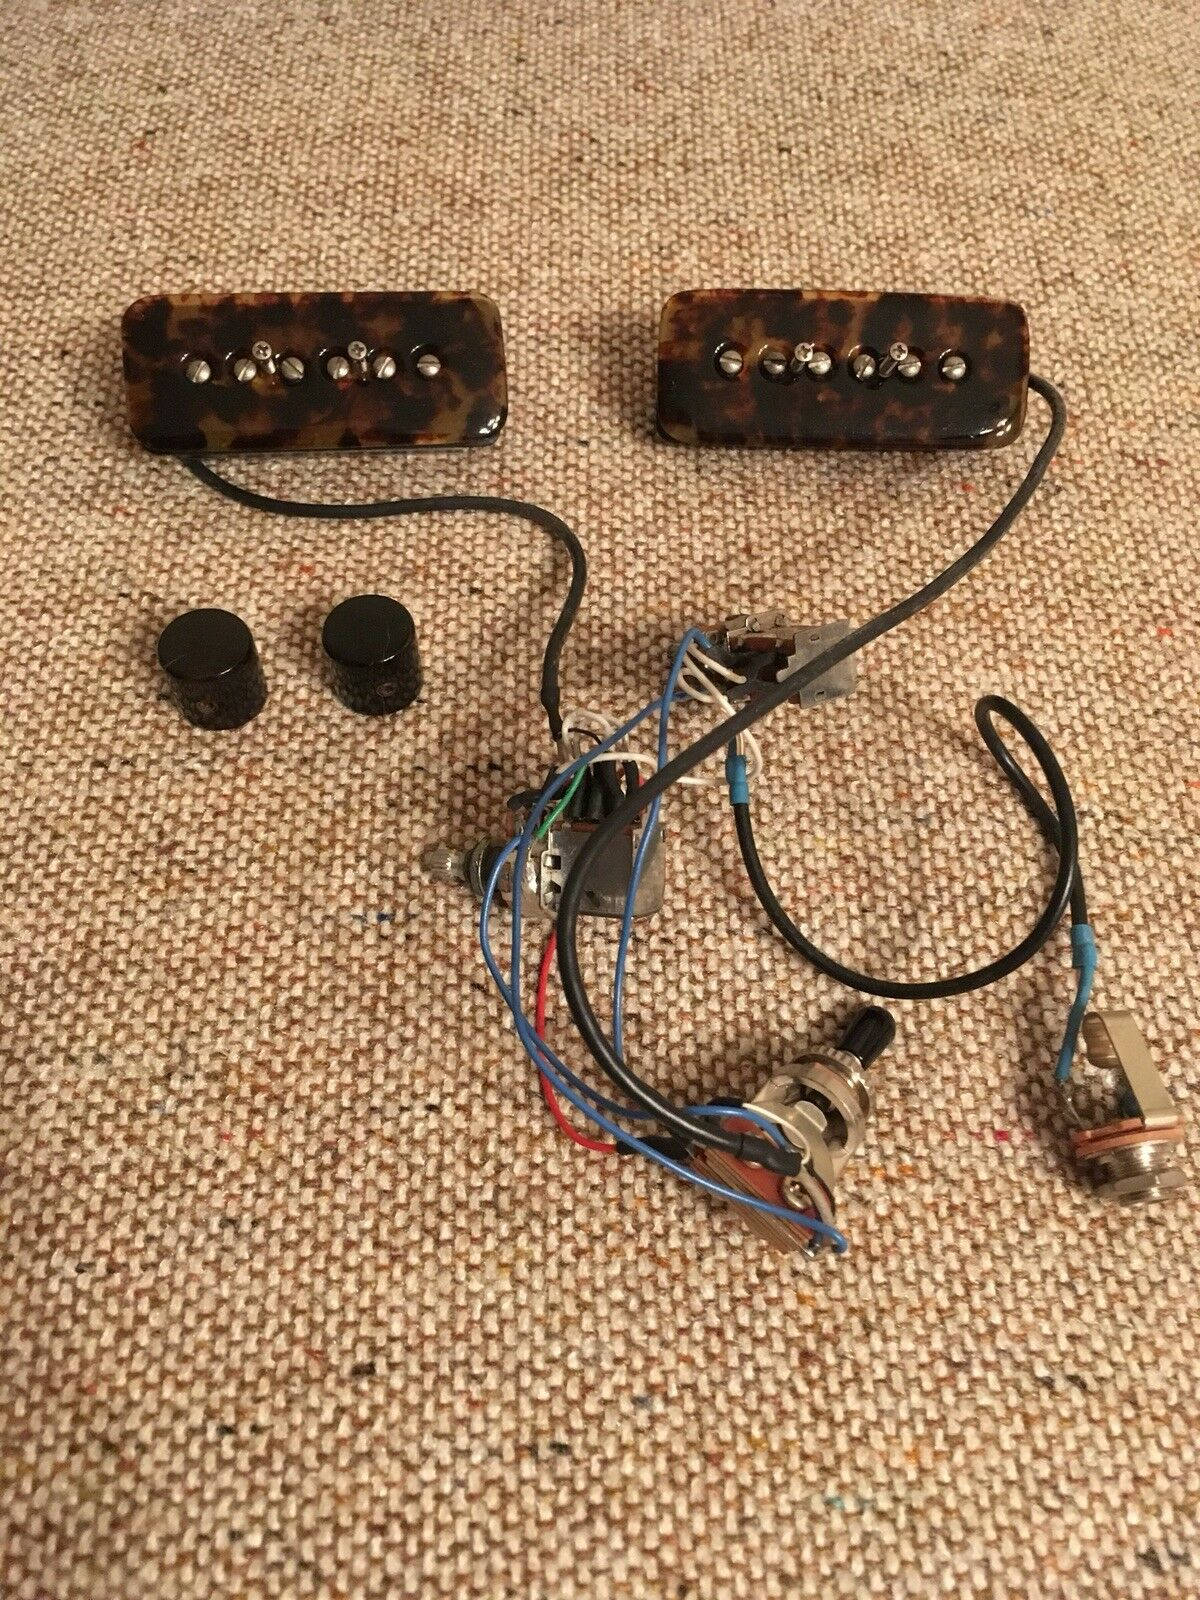 2001-2002 Lindy Fralin Spalt Guitar Pickups All Wirot P-90 0d65533;0d65533s;s Tortoise Shell